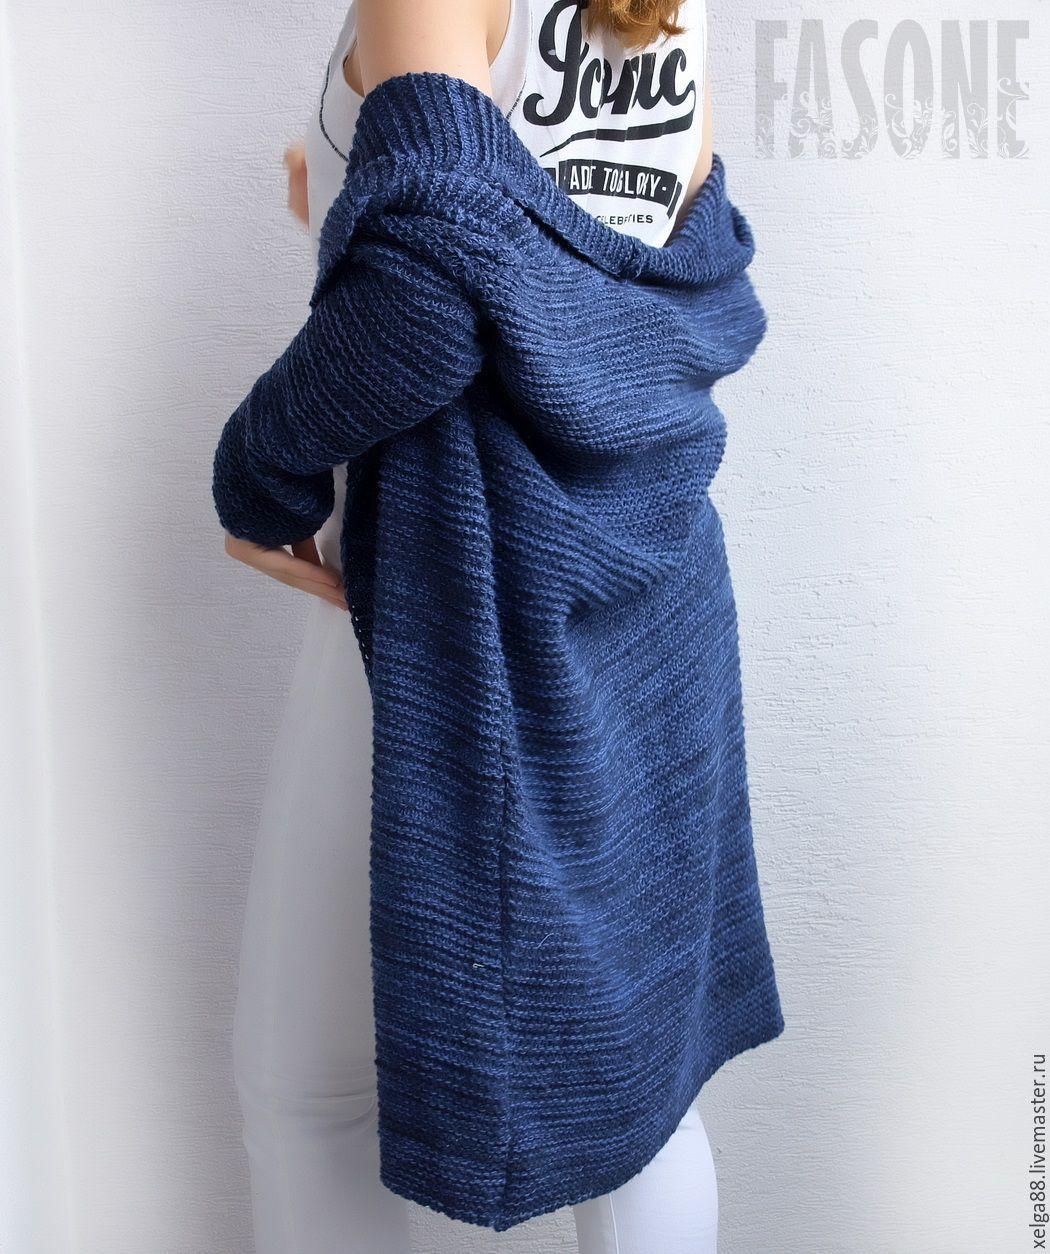 Женский кардиган синий оверсайз Синий хлопковый кардиган, Кардиганы, Москва,  Фото №1